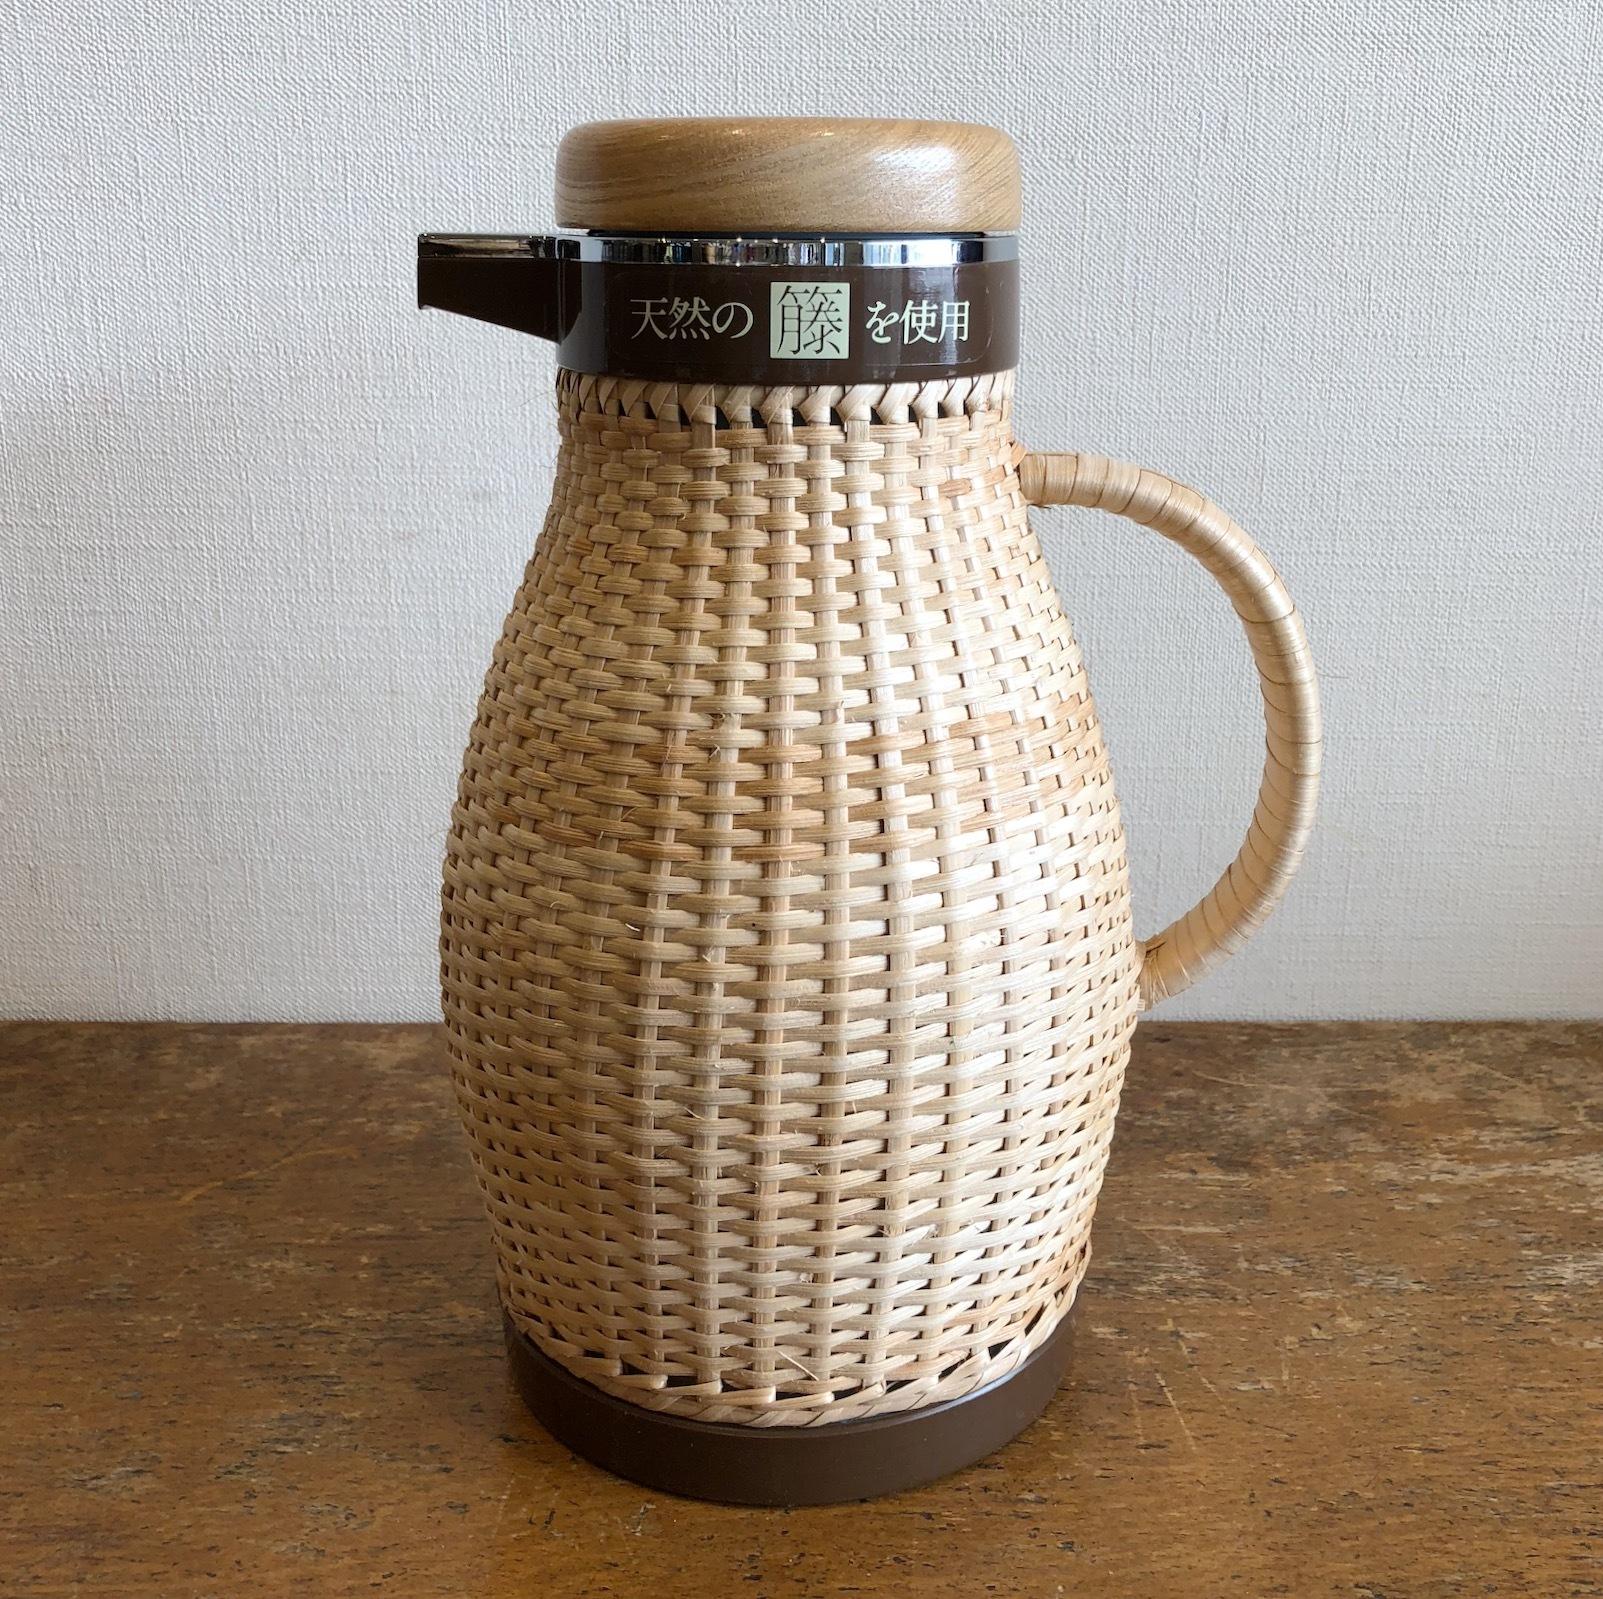 象印藤編み魔法瓶